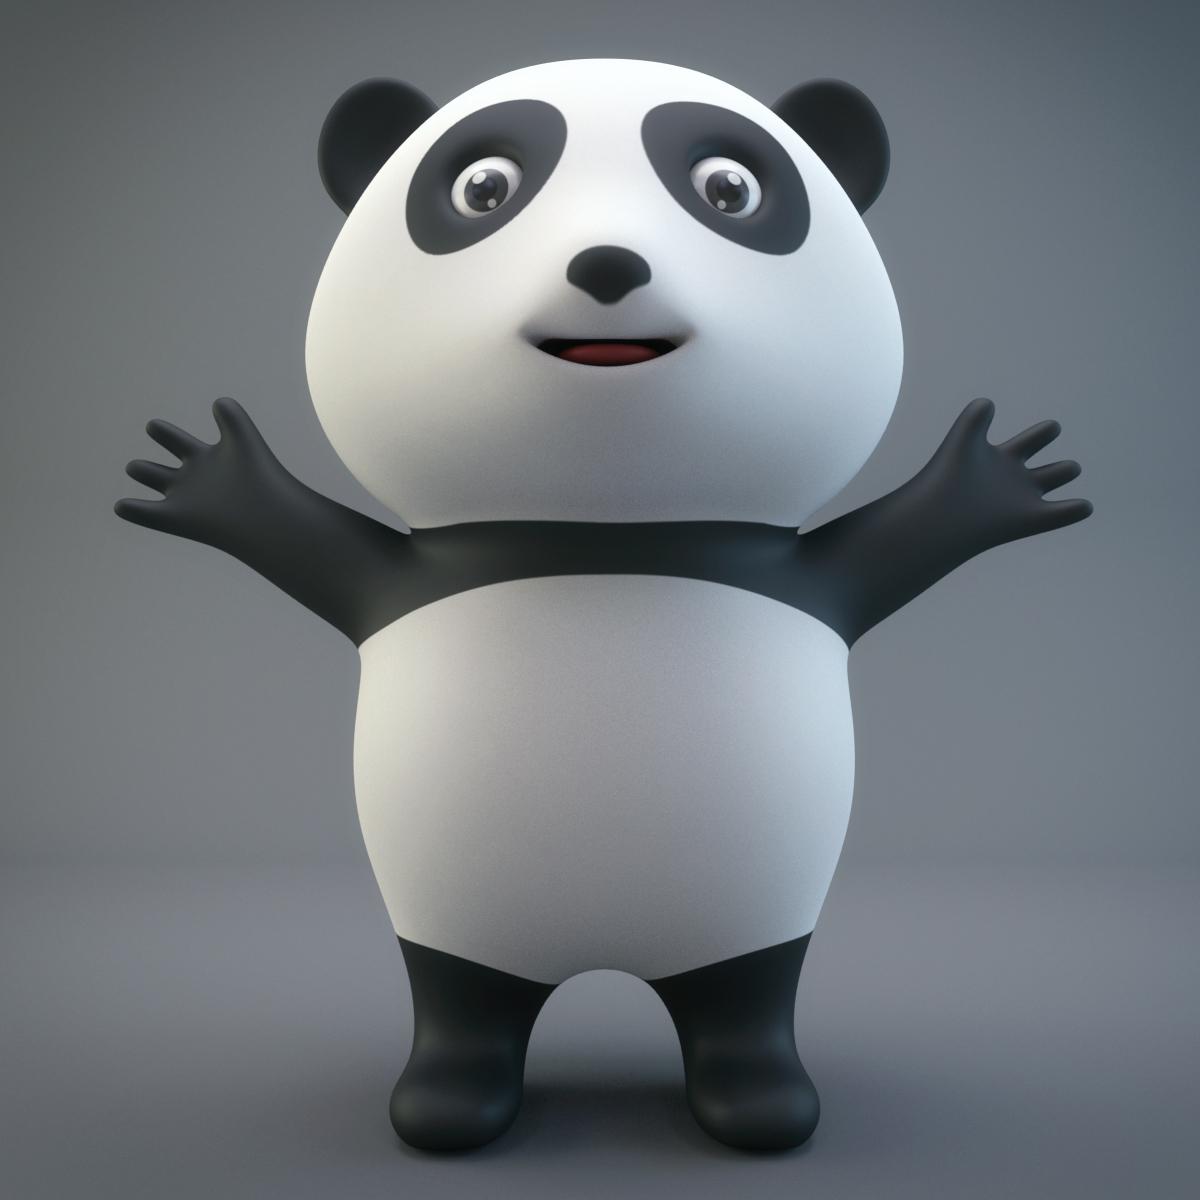 Cartoon Panda By Geek World 3docean